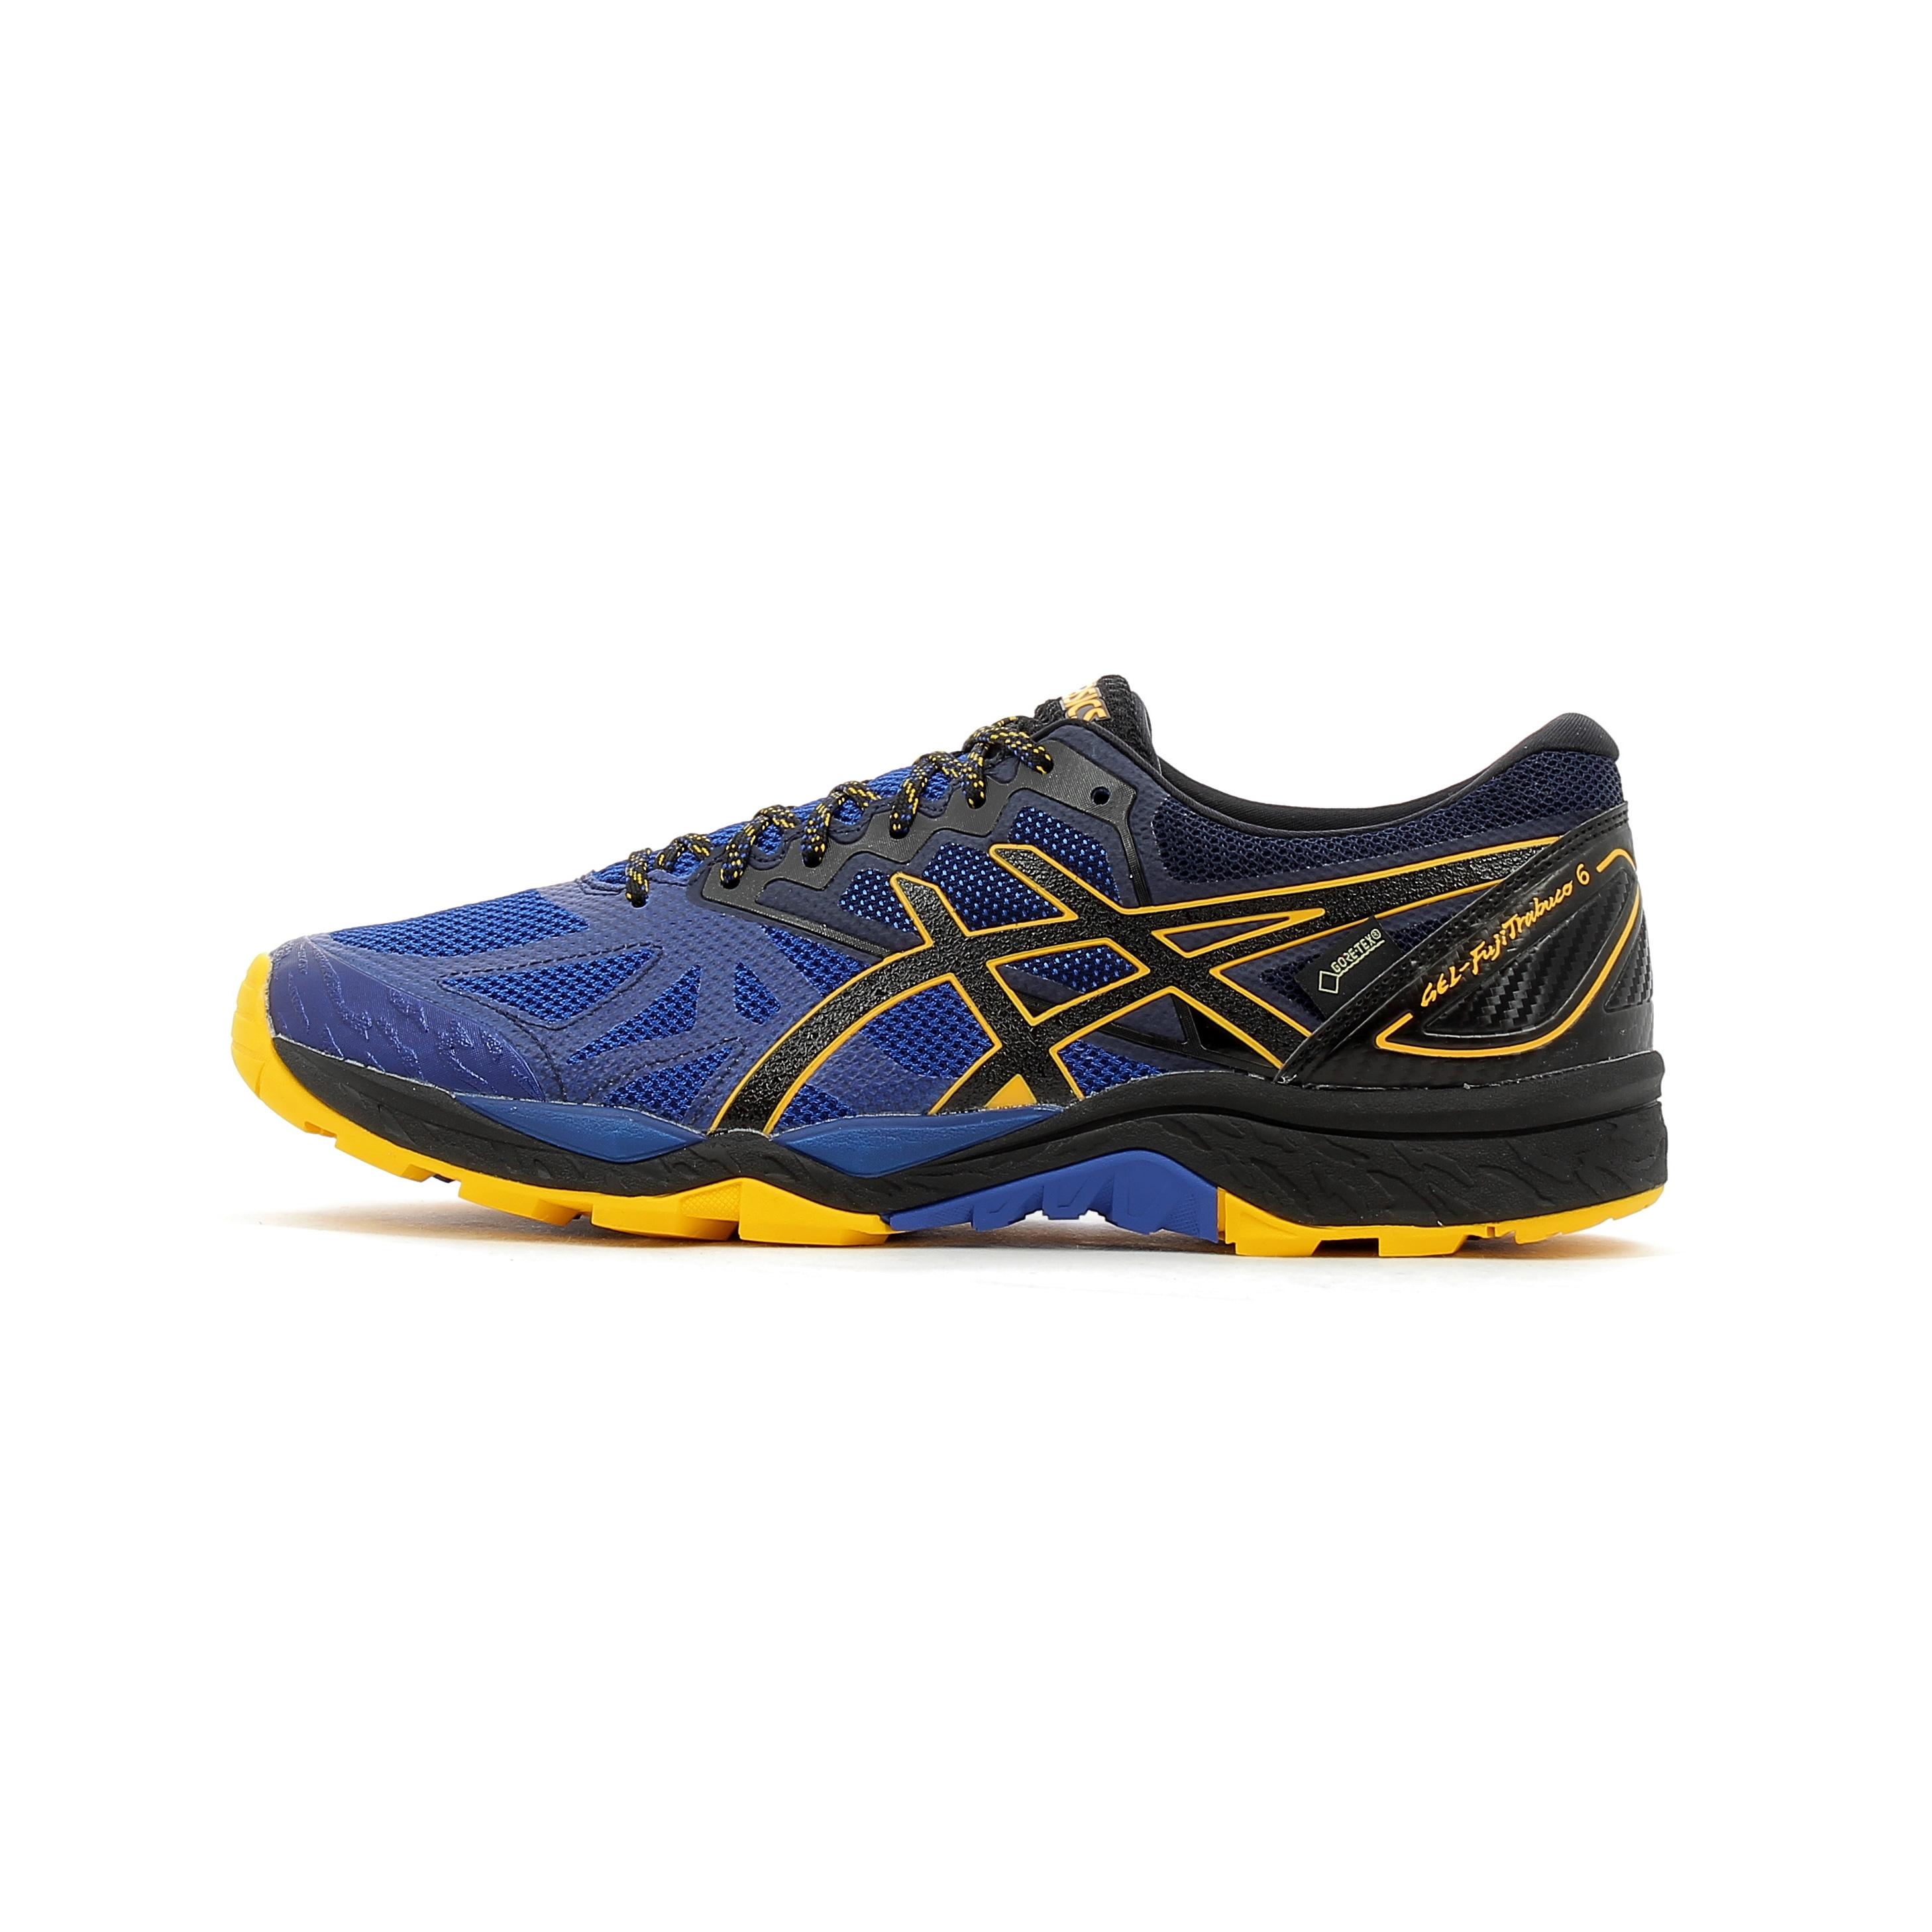 9938099992477 Chaussure de trail Asics Gel Fujitrabuco 6 Gore-Tex